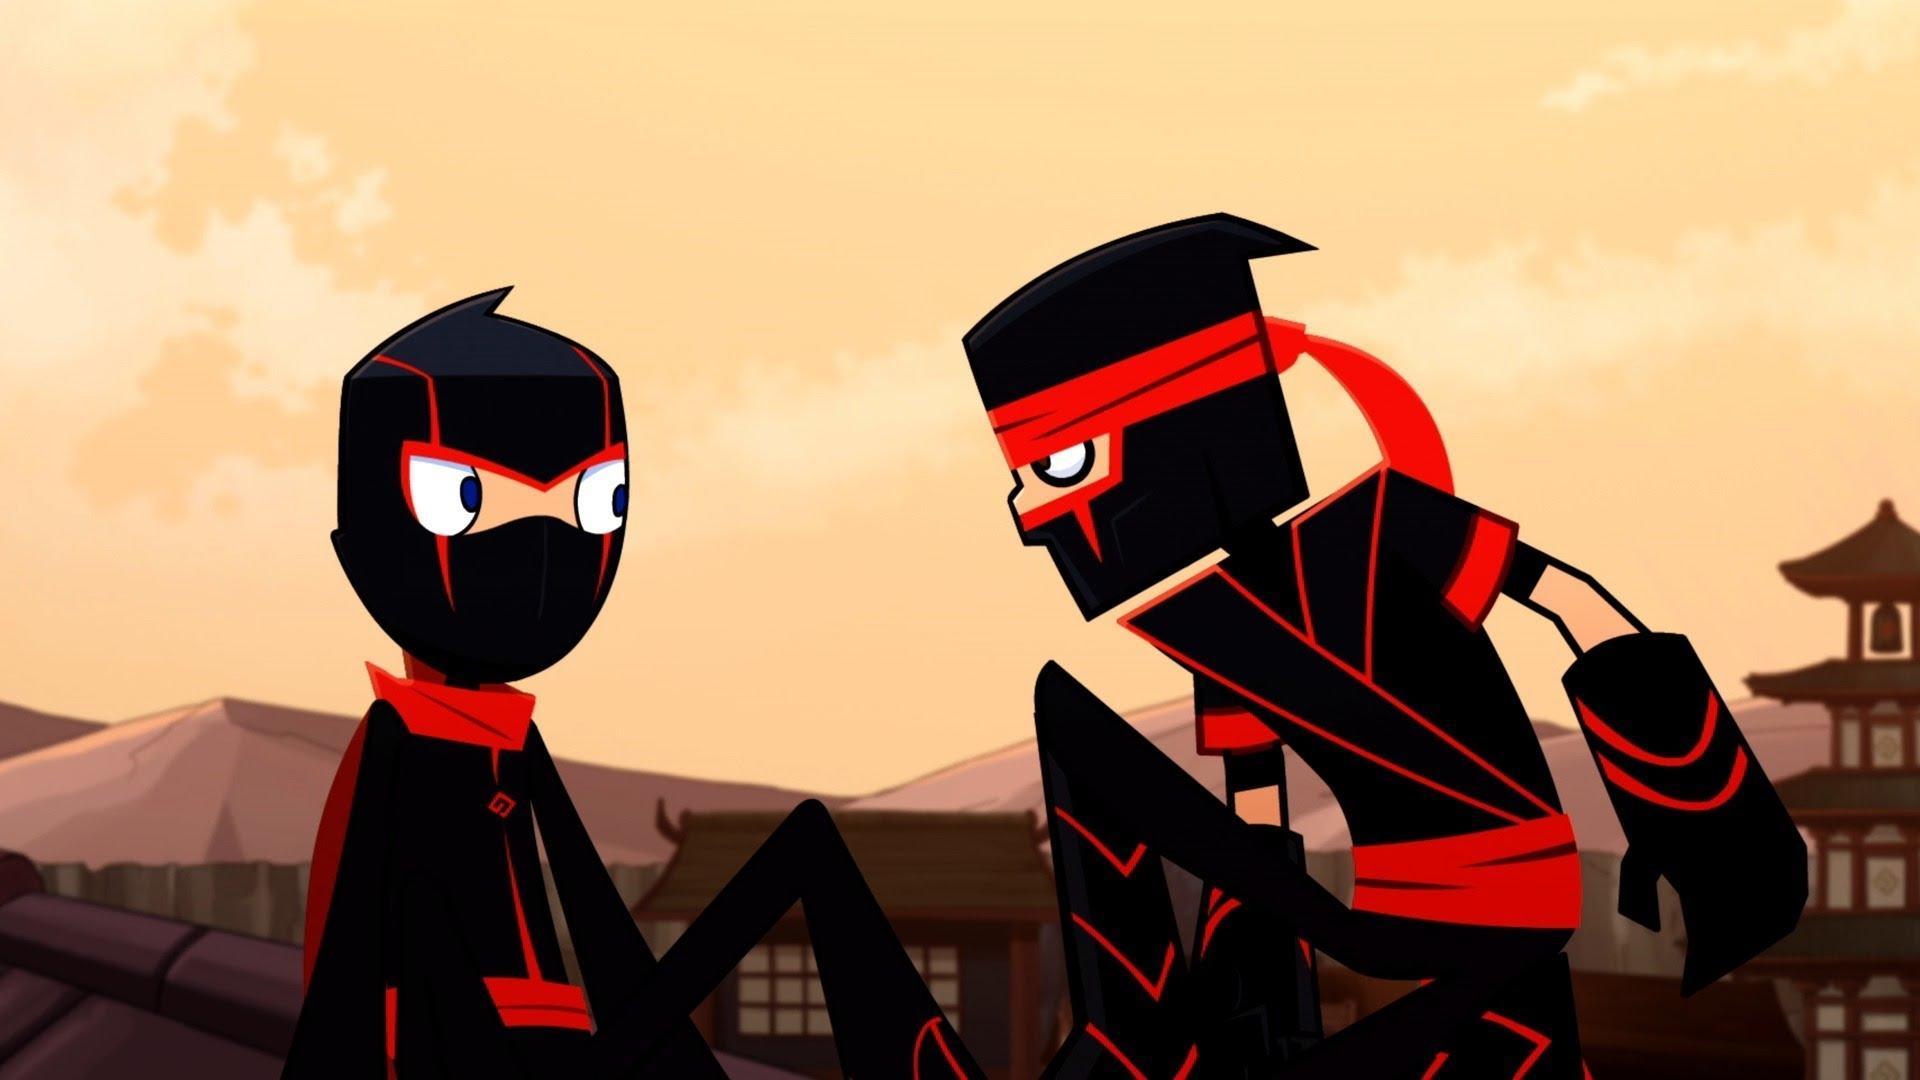 Randy Cunningham 9th Grade Ninja wallpapers HD quality